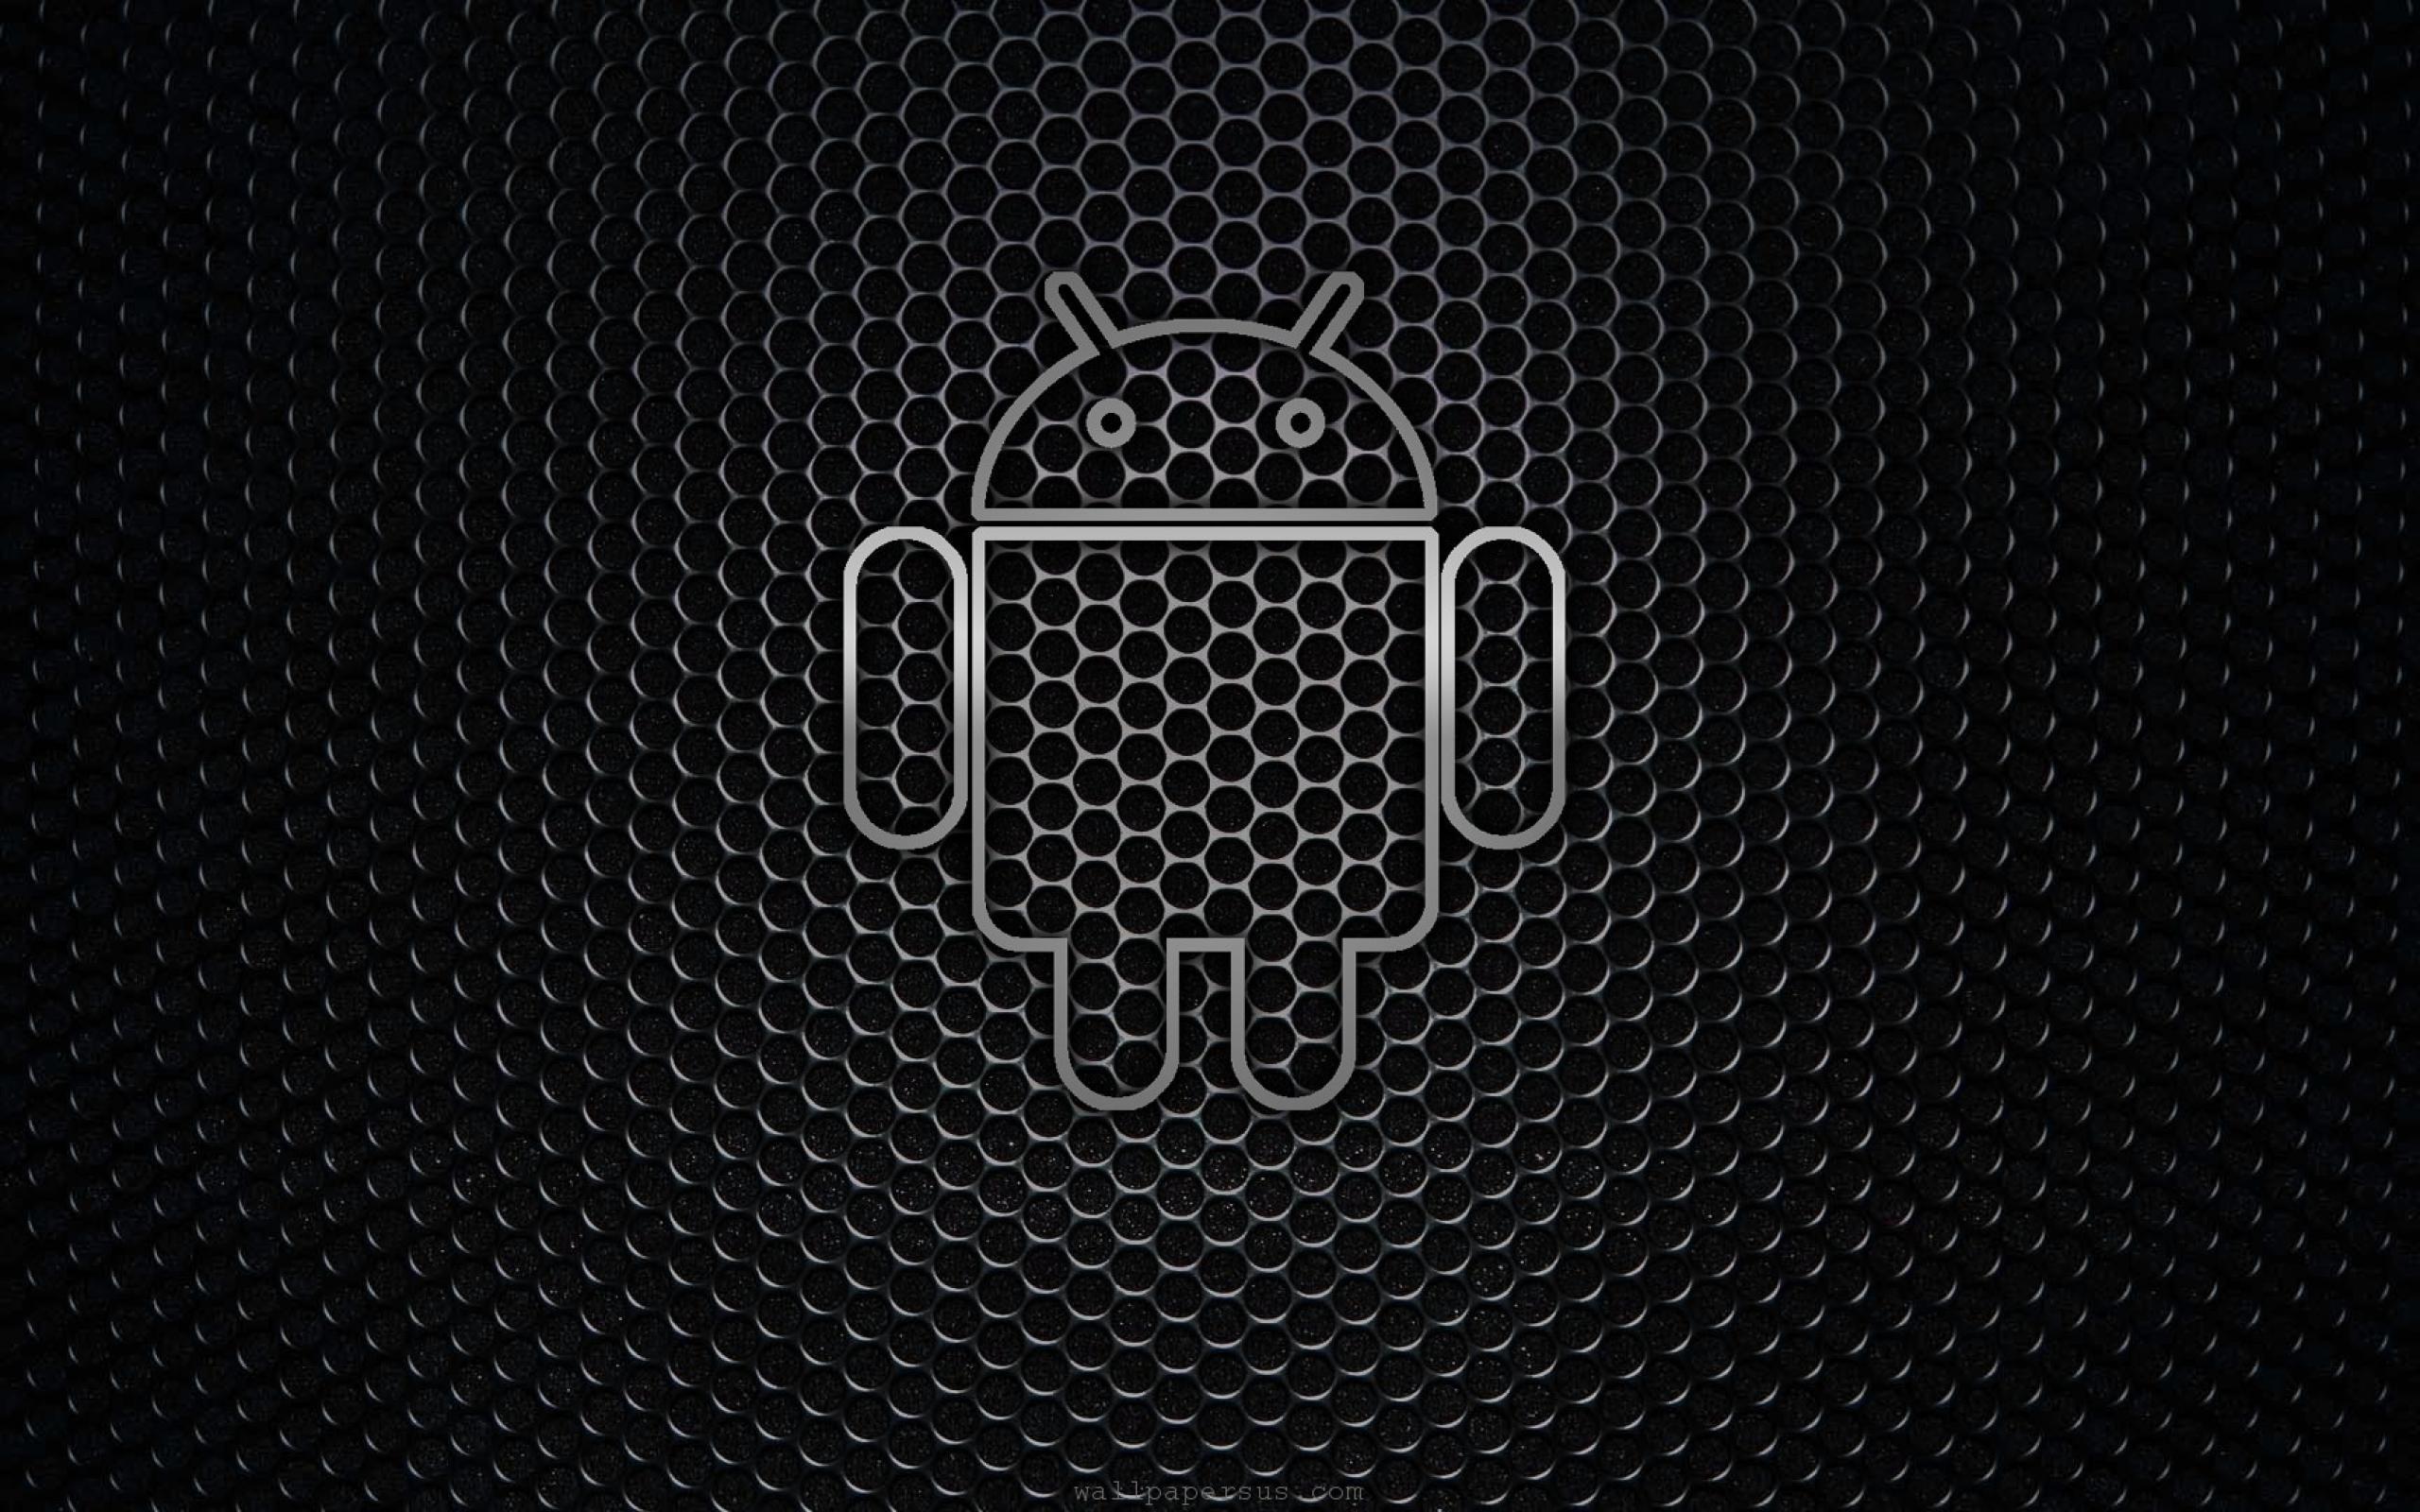 desktop android black logo background wallpaper 2560x1600 2560x1600